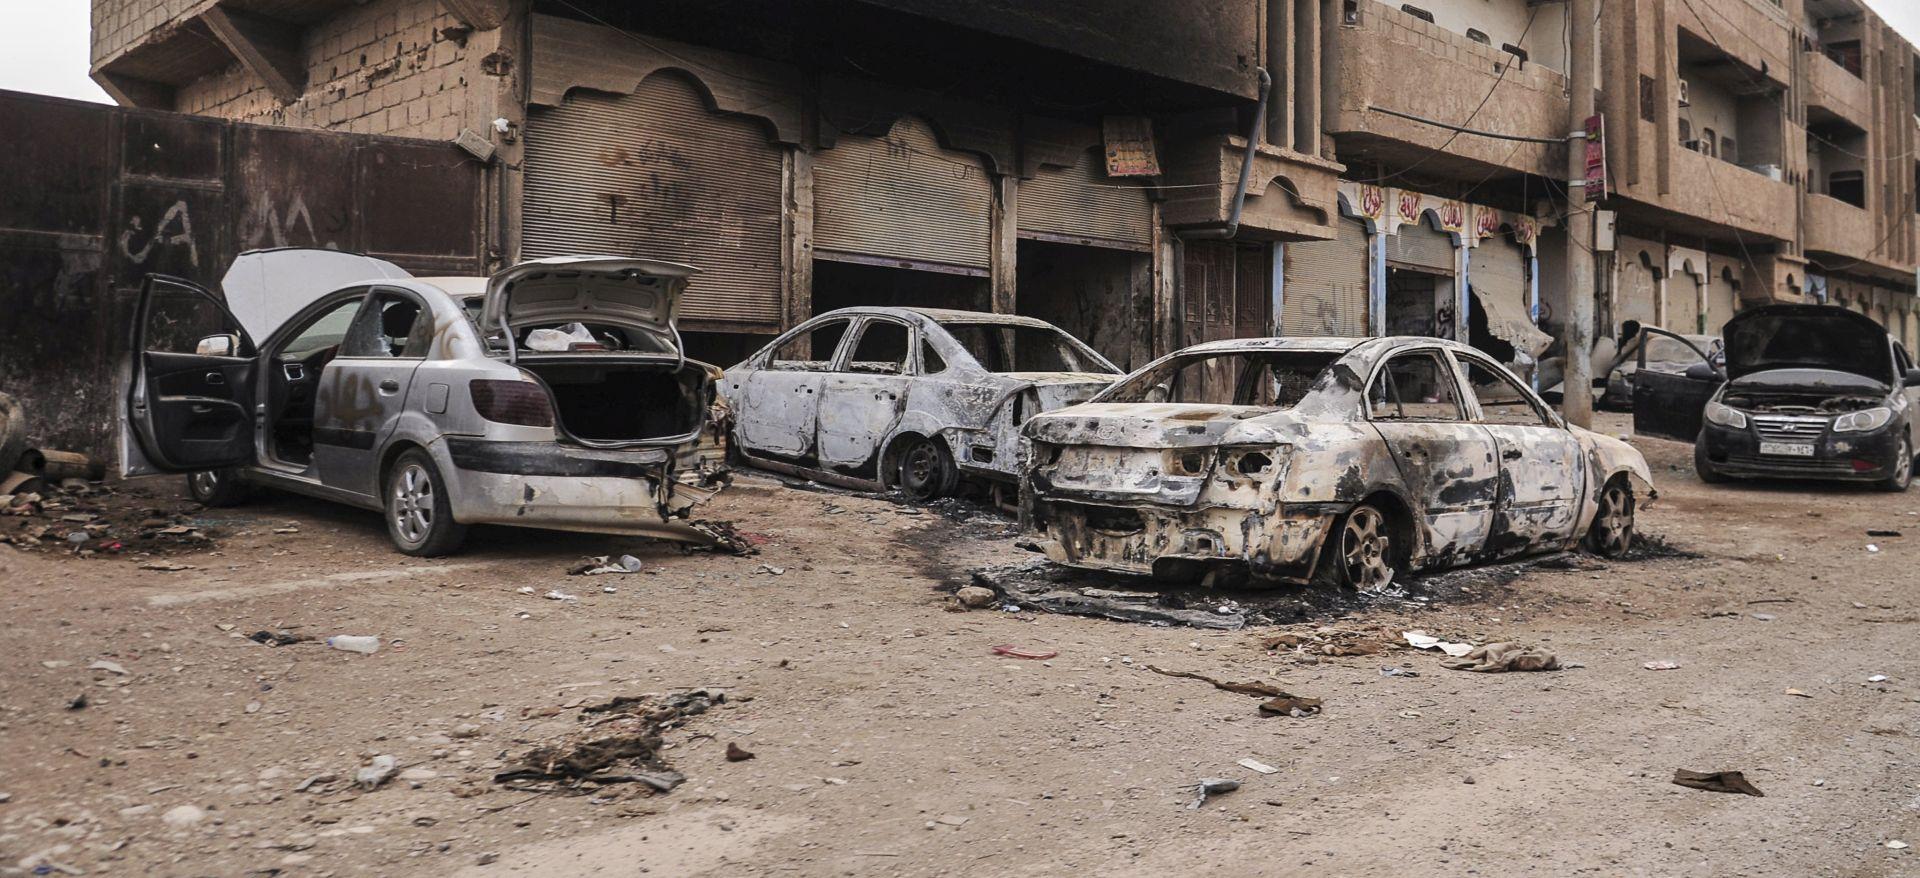 Četiri ruska vojnika poginula kod Deir al-Zora